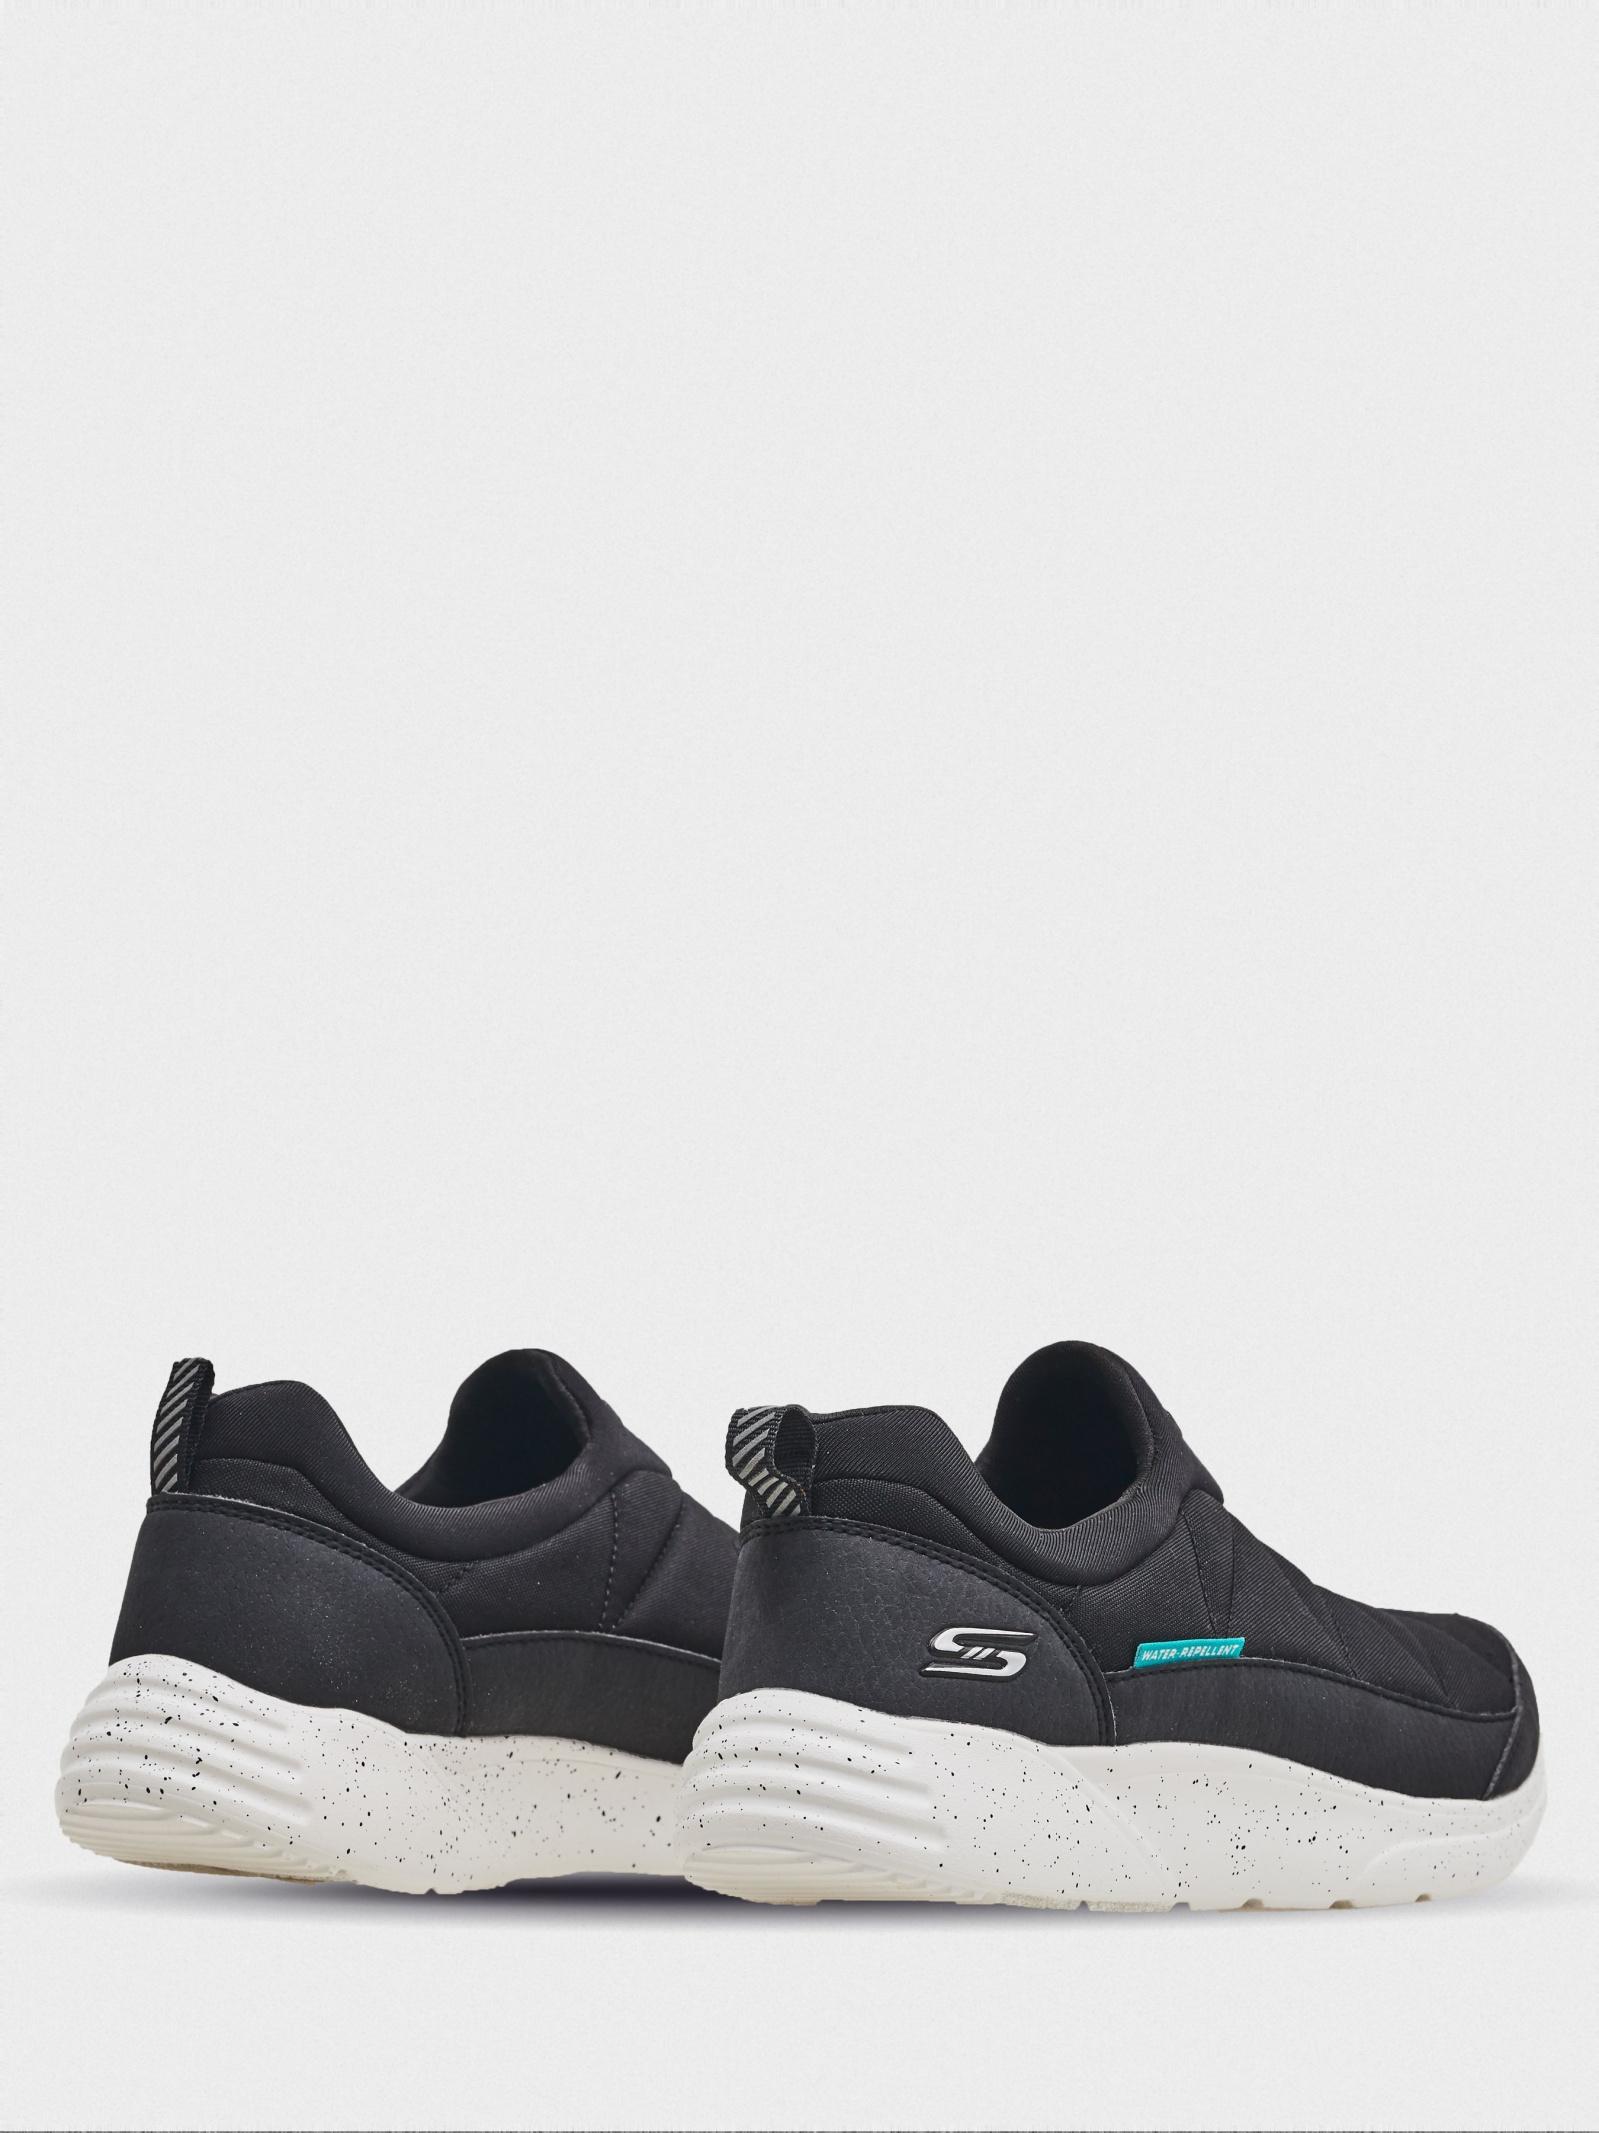 Кроссовки для женщин Skechers KW5399 , 2017